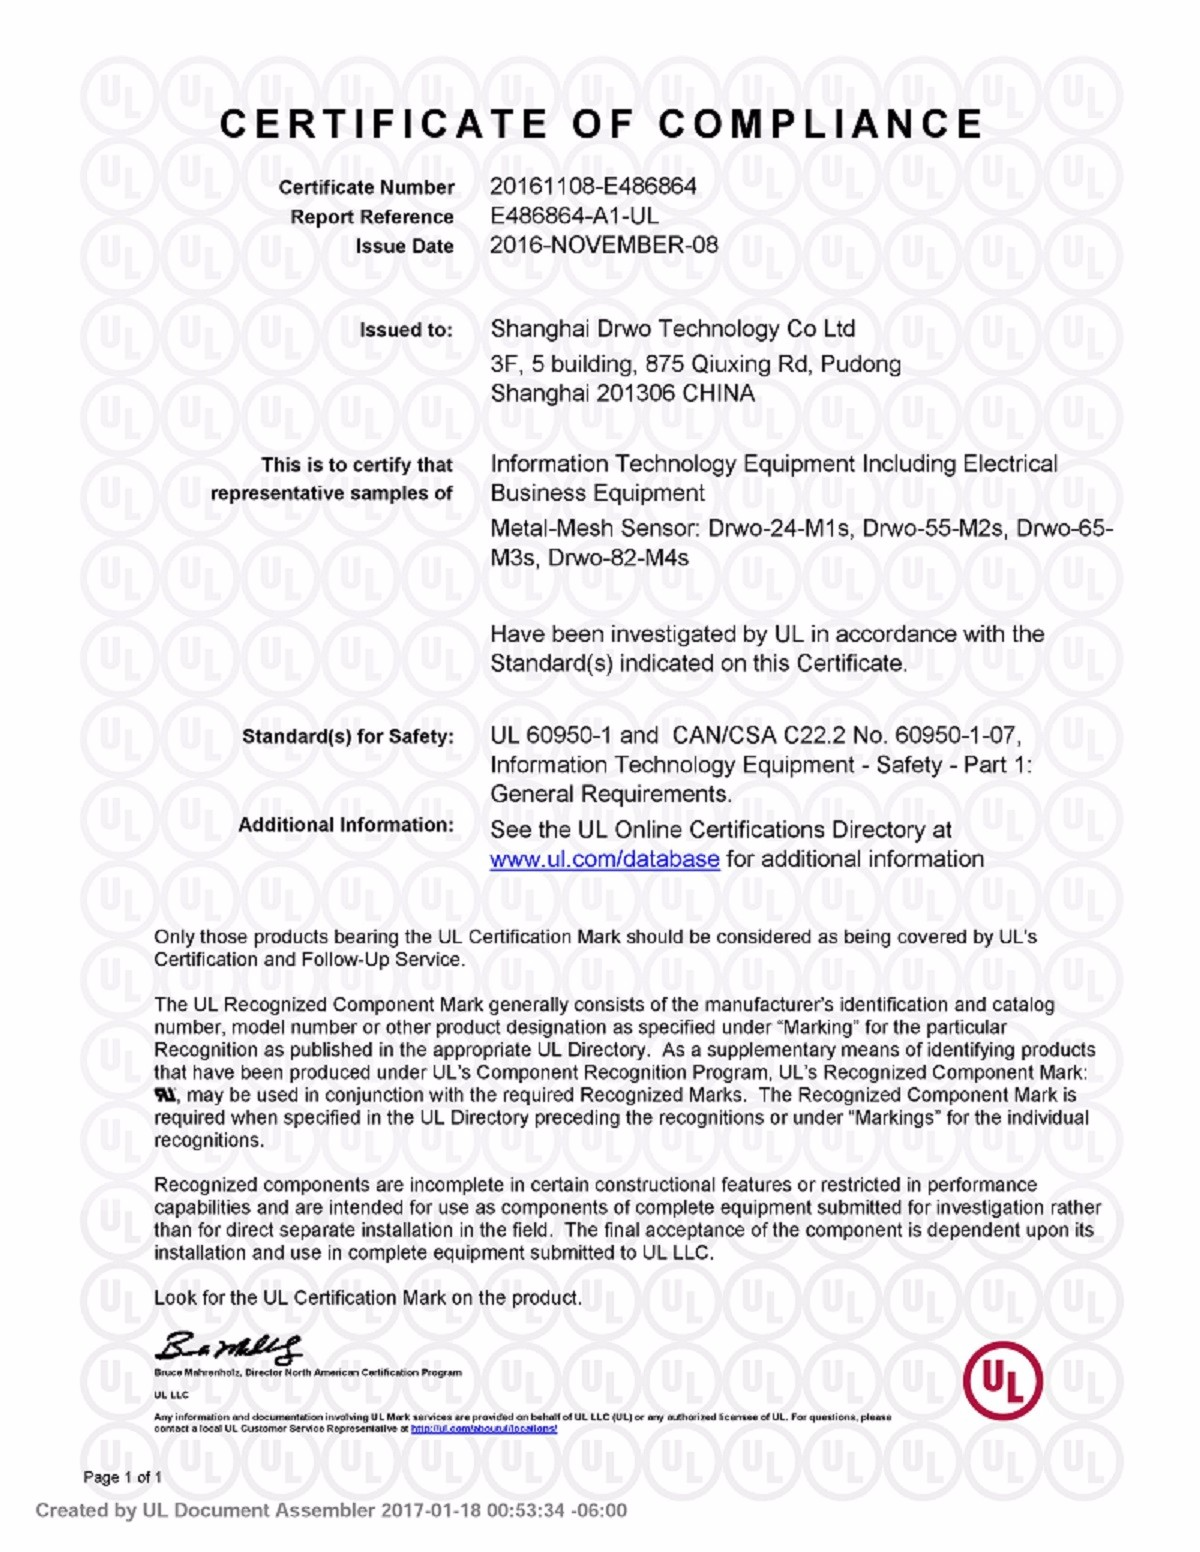 UL-E486864-20161101-report-1.jpg